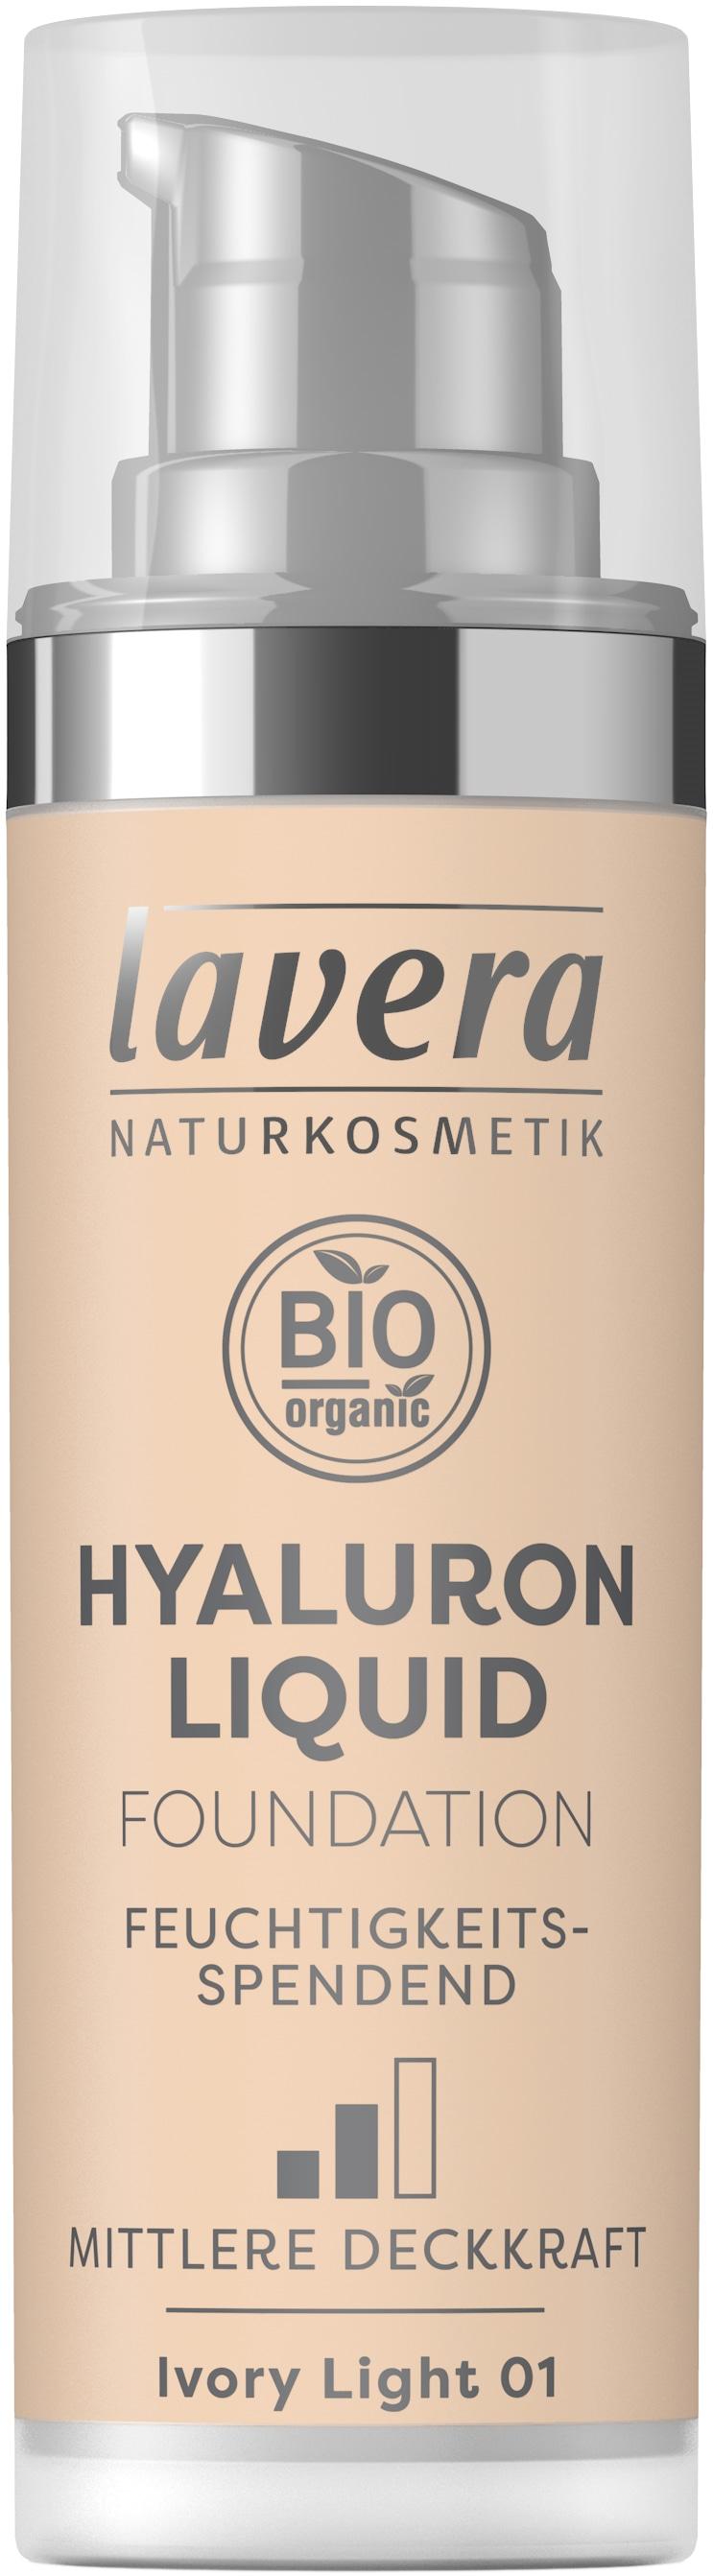 Hyaluron Liquid Foundation -Ivory Light 01-